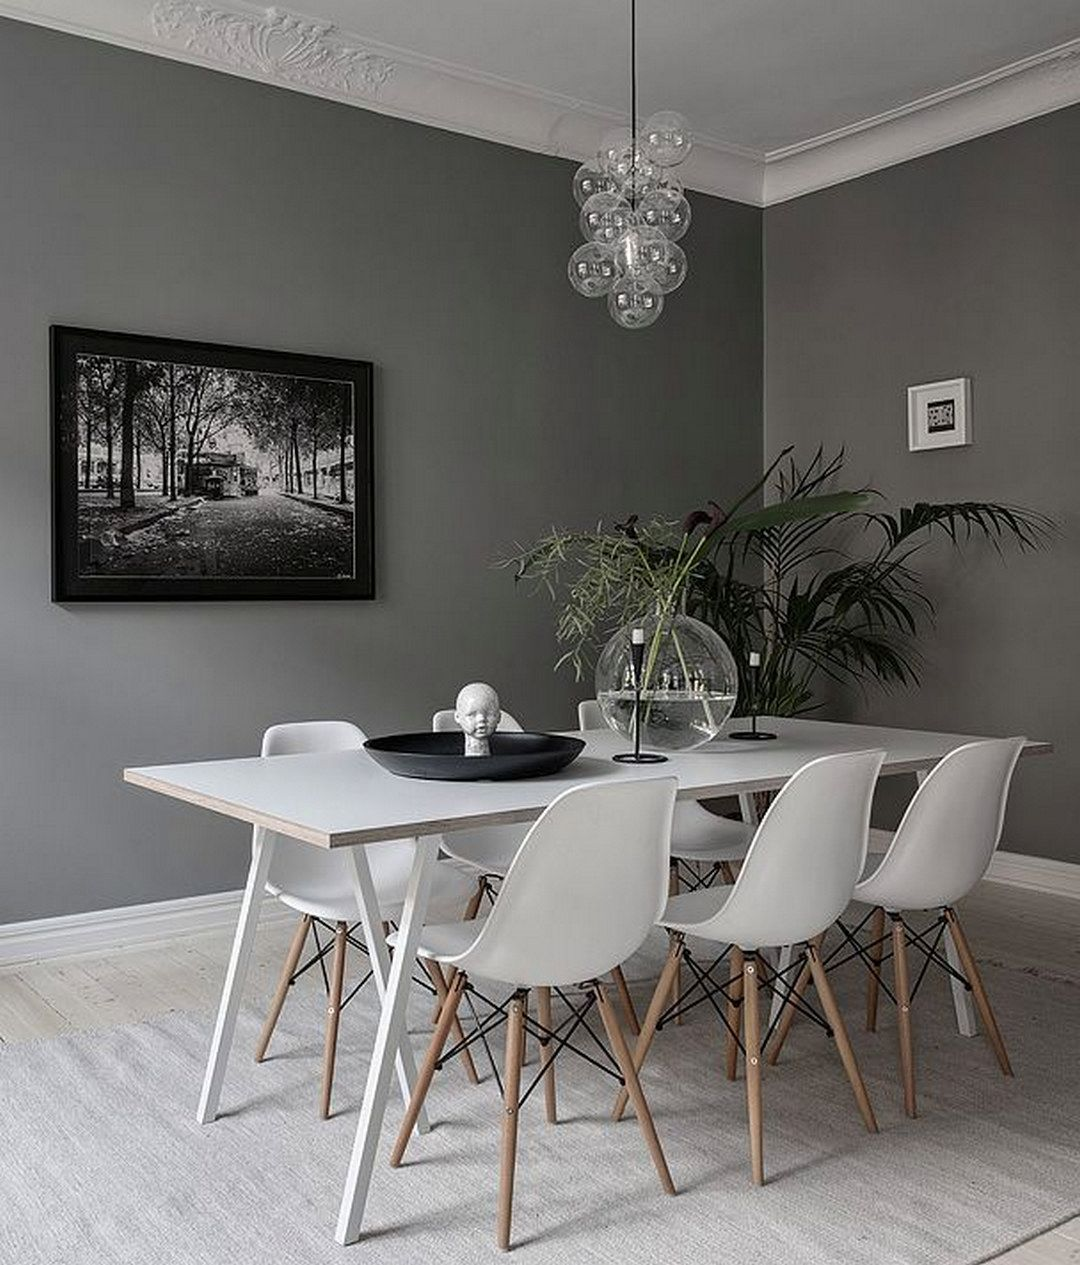 13 Dining Room And Kitchen Design Minimalist: 99 Fantastic Minimalist Home Decor Ideas